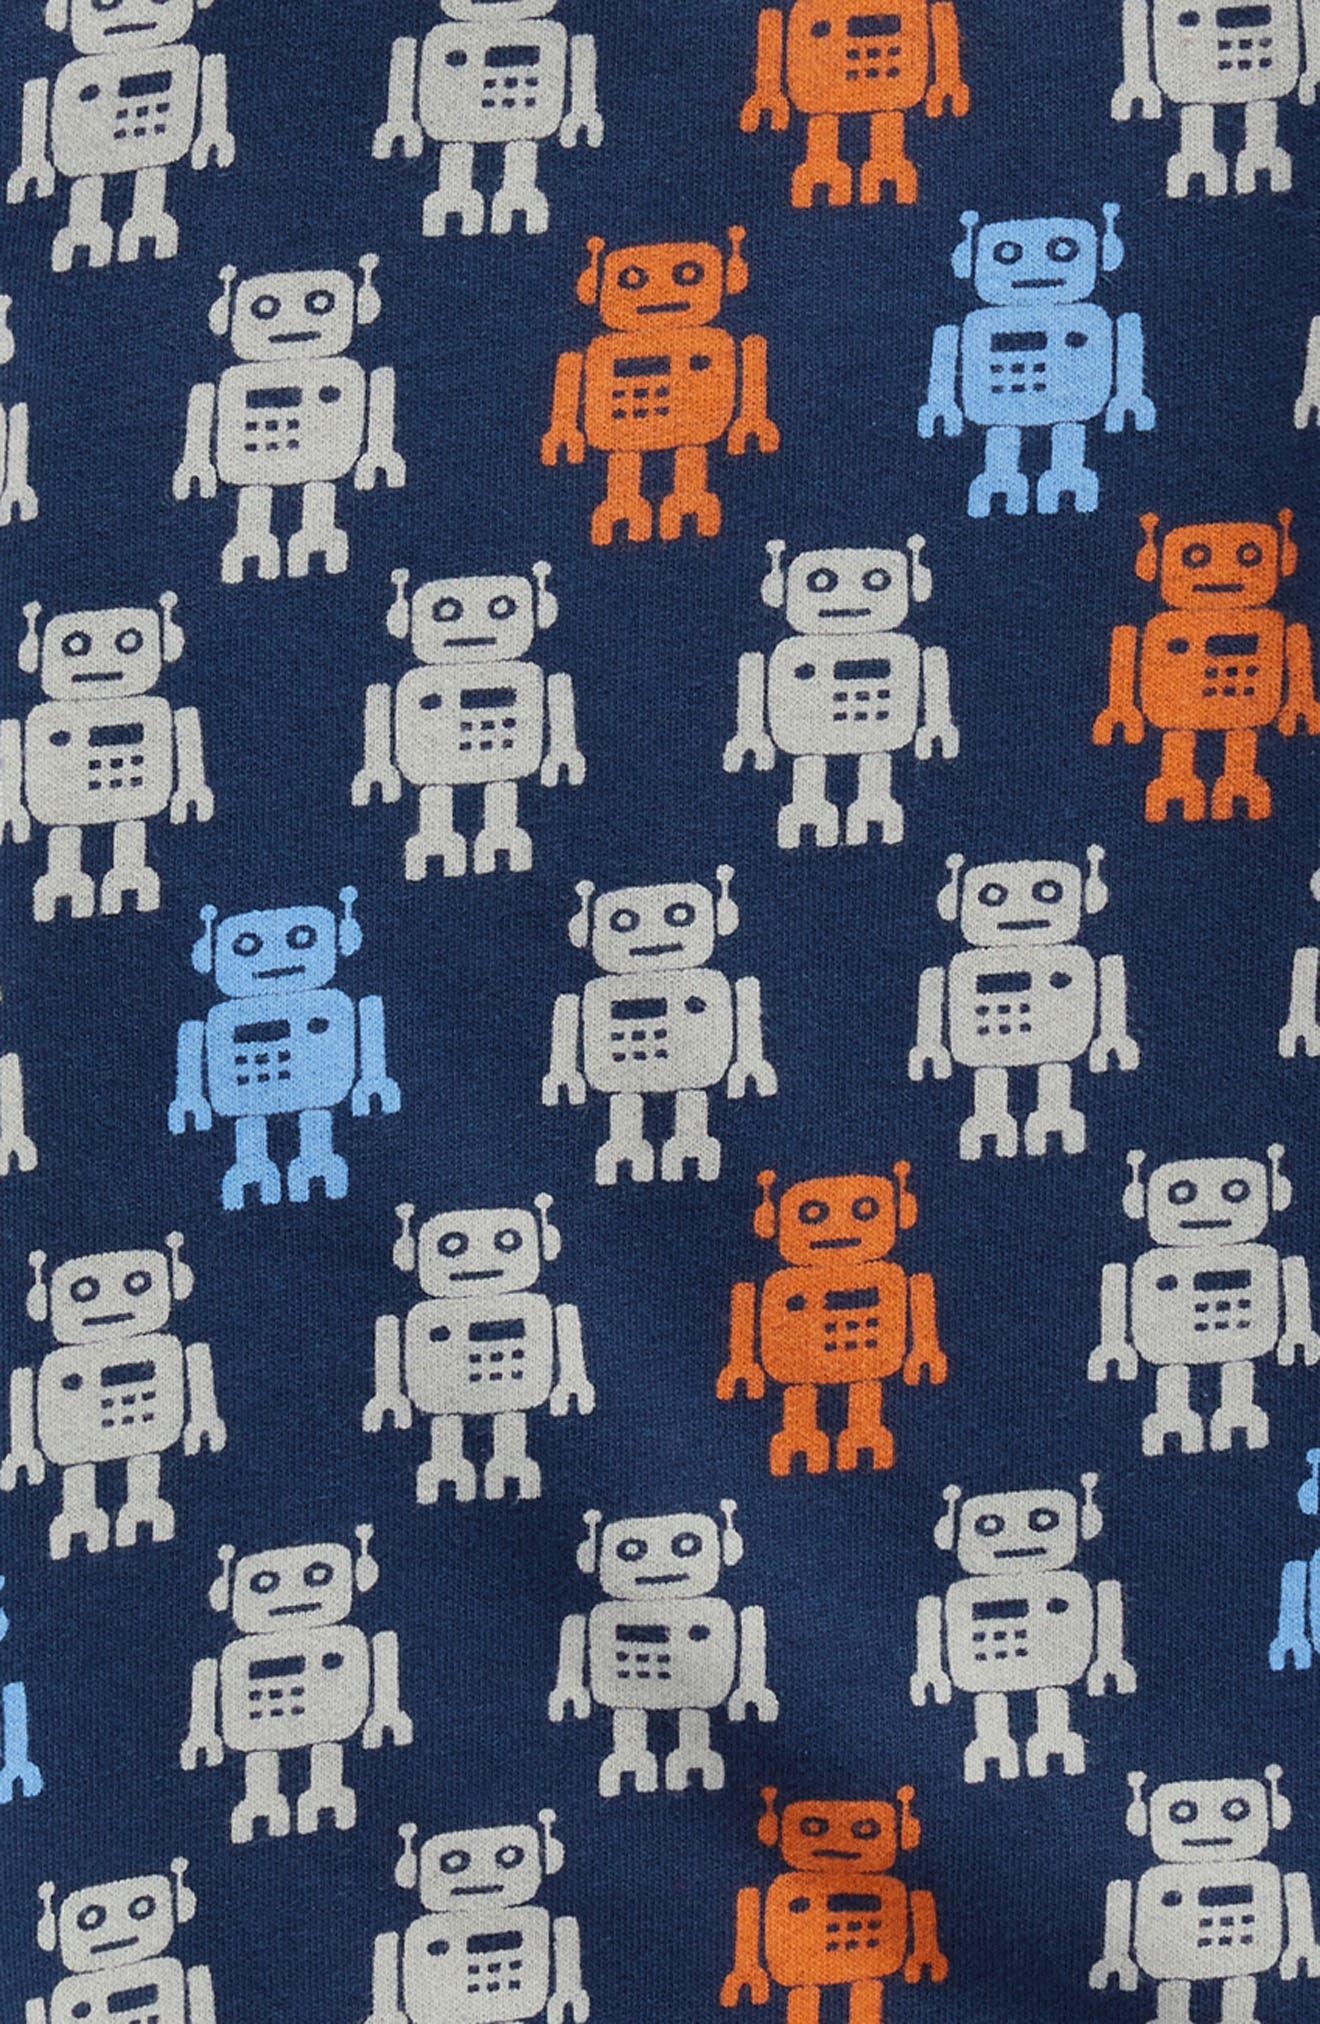 Robot Print Sweatshirt,                             Alternate thumbnail 2, color,                             410